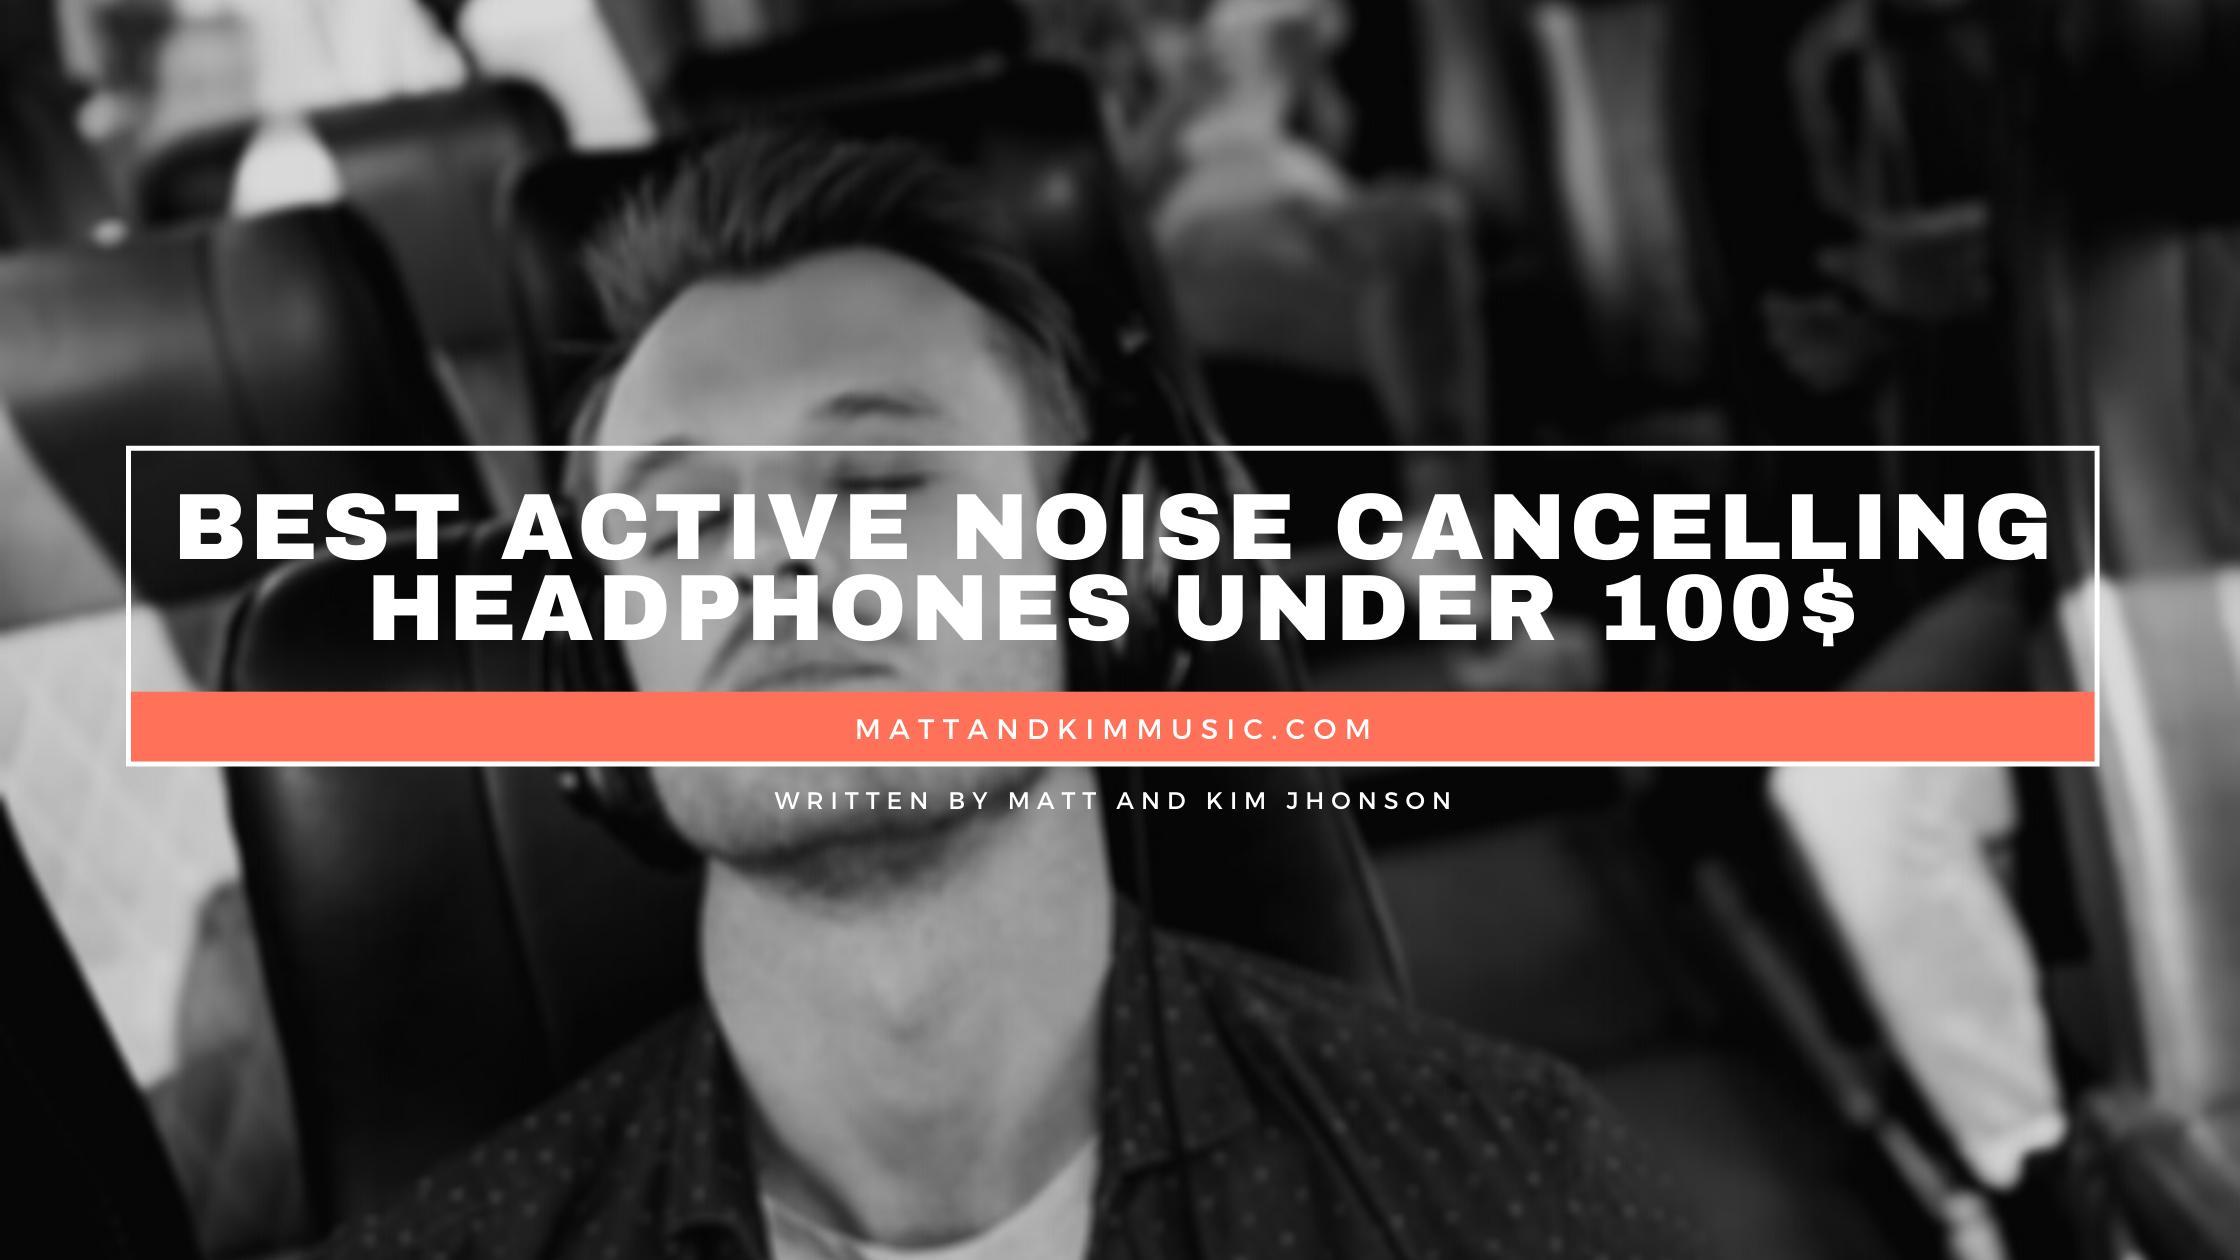 best active noise cancelling headphones under 100